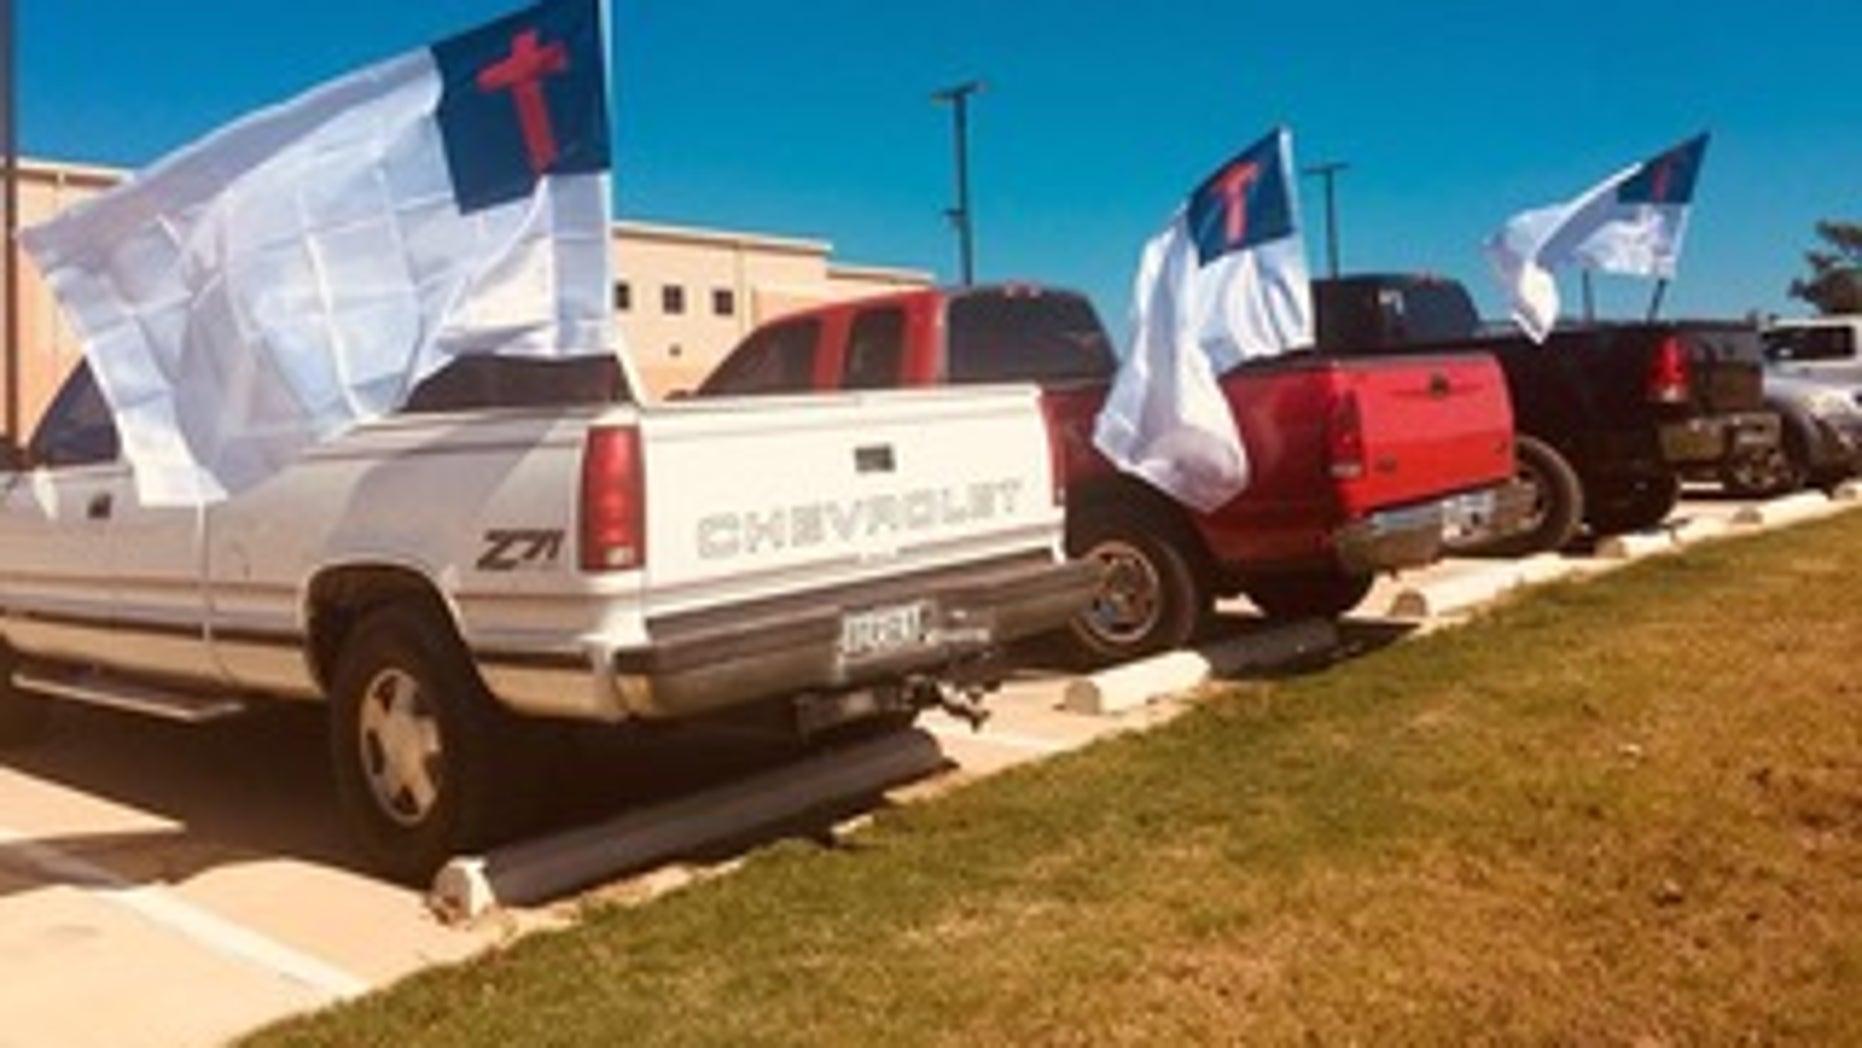 Students' trucks flying the Christian flag at LaPoynor High School in LaRue, Texas.